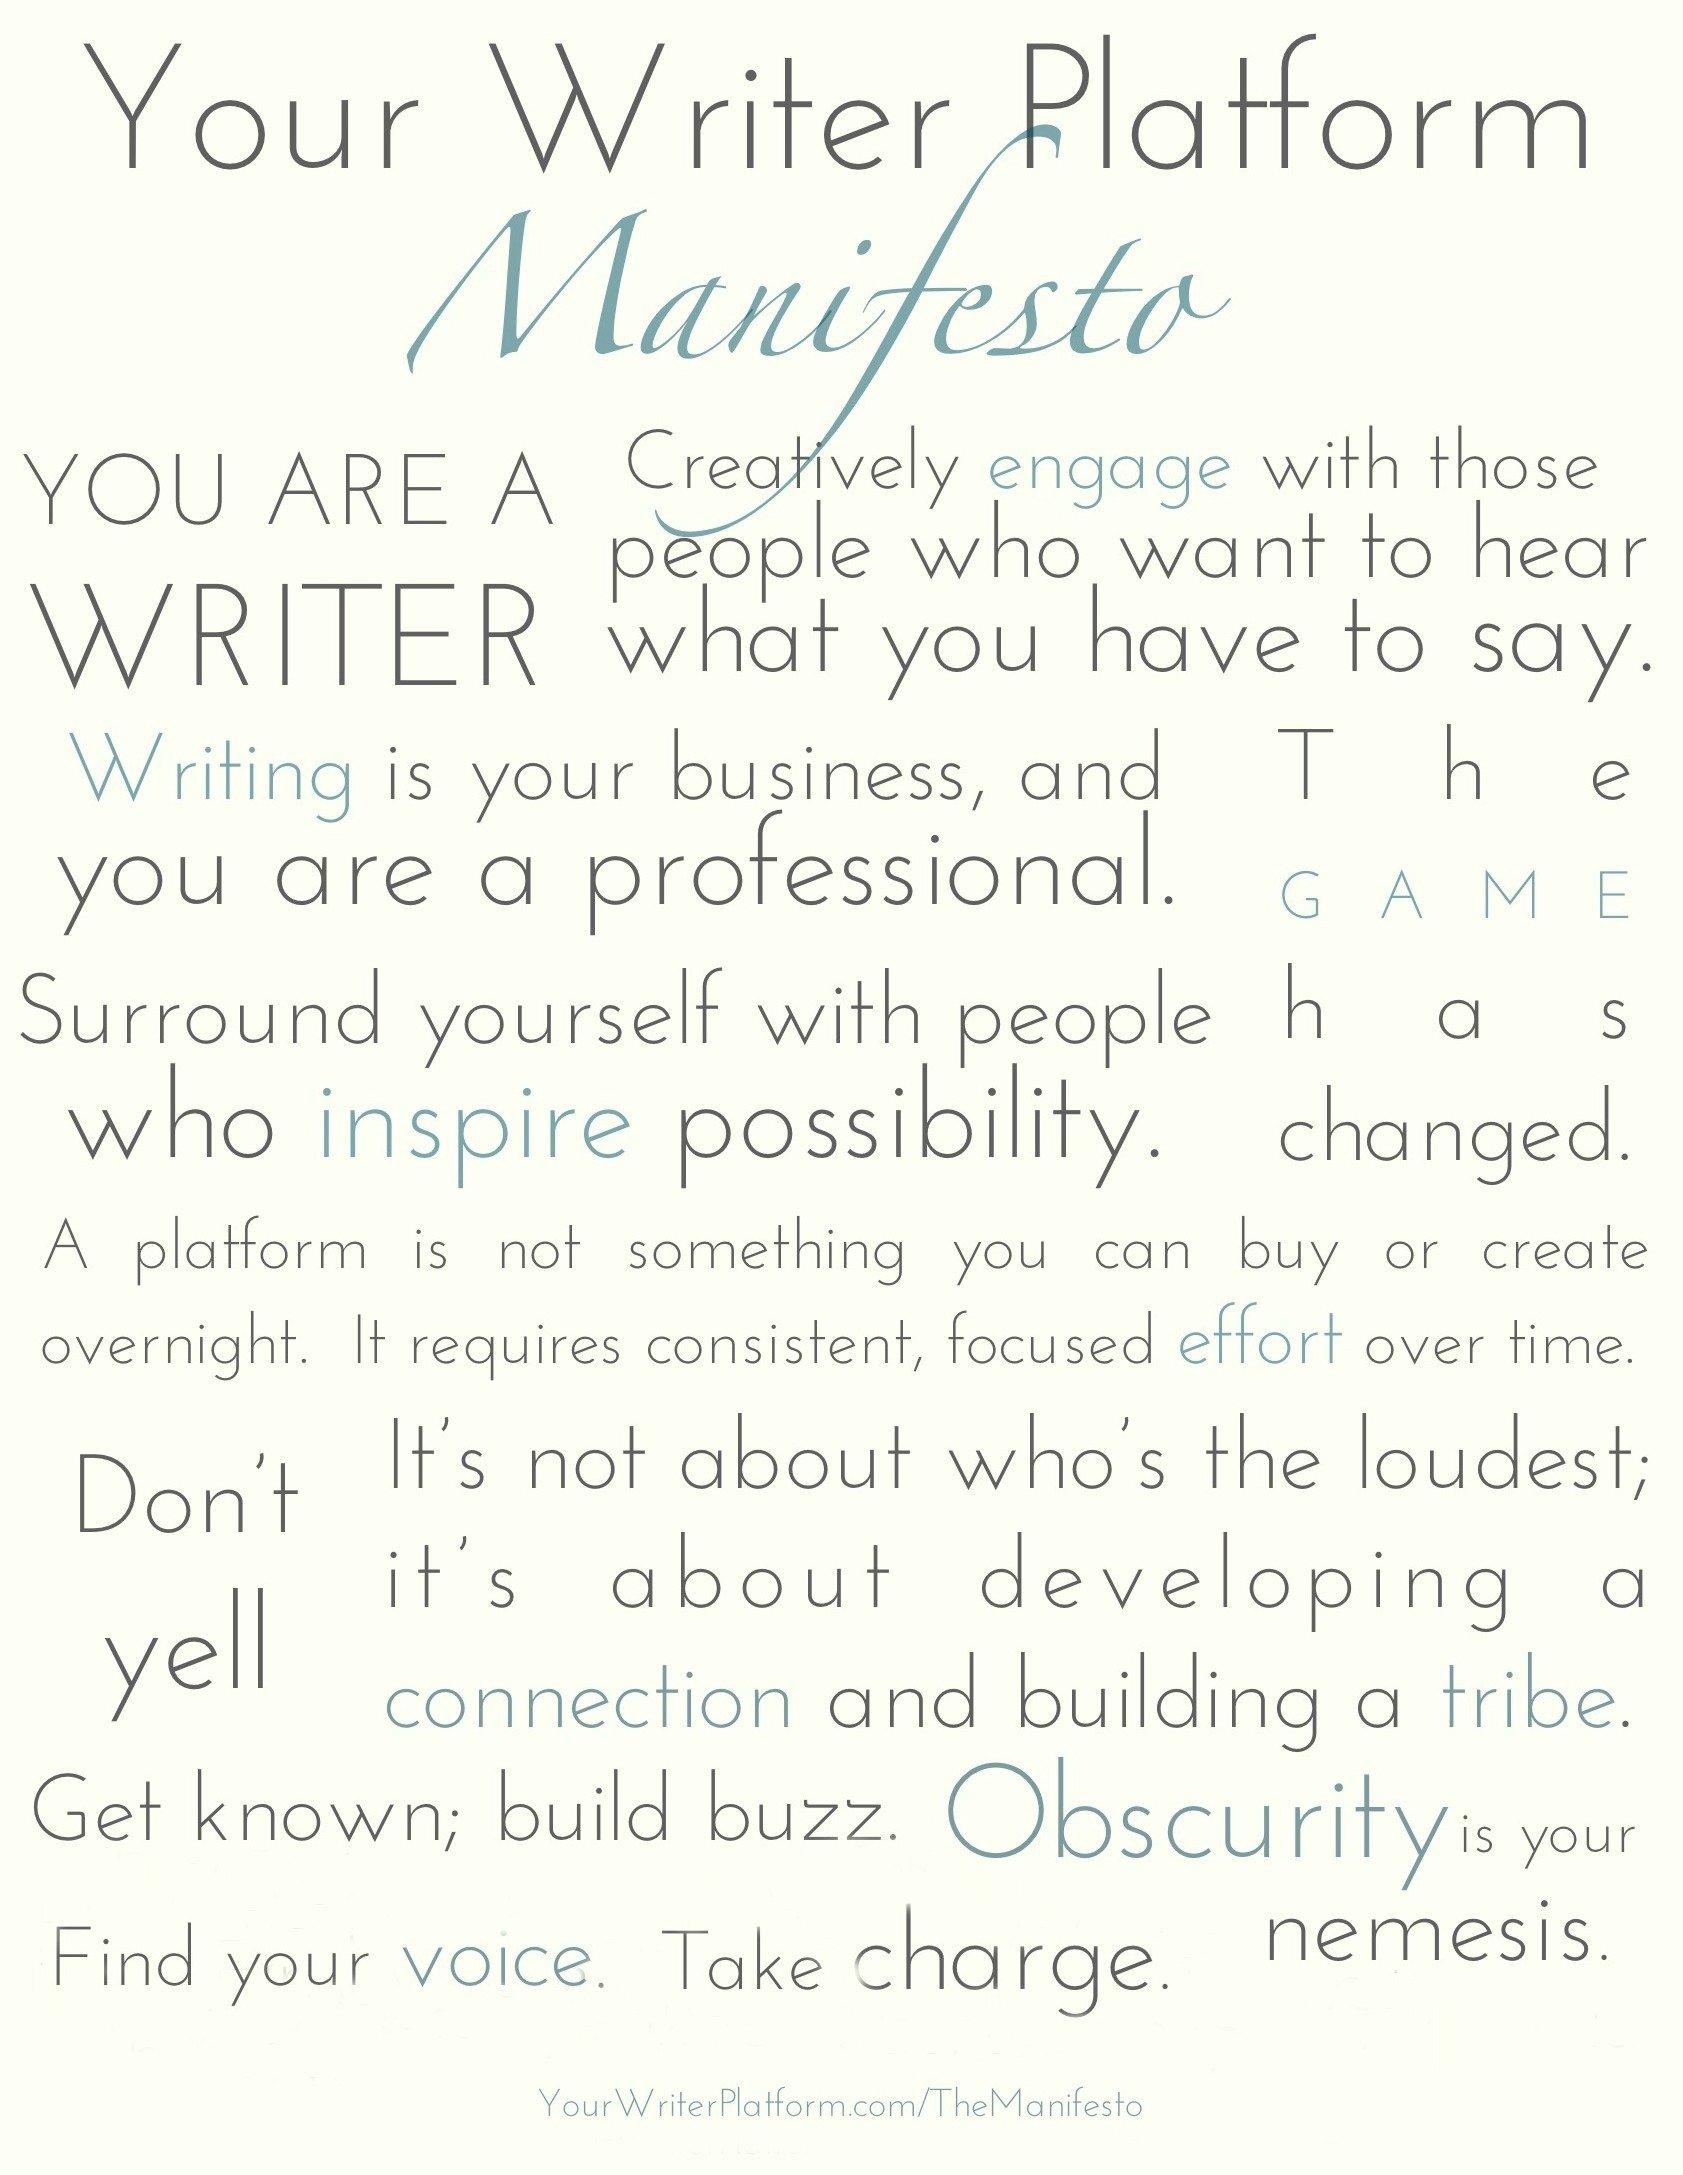 Your Writer Platform Manifesto